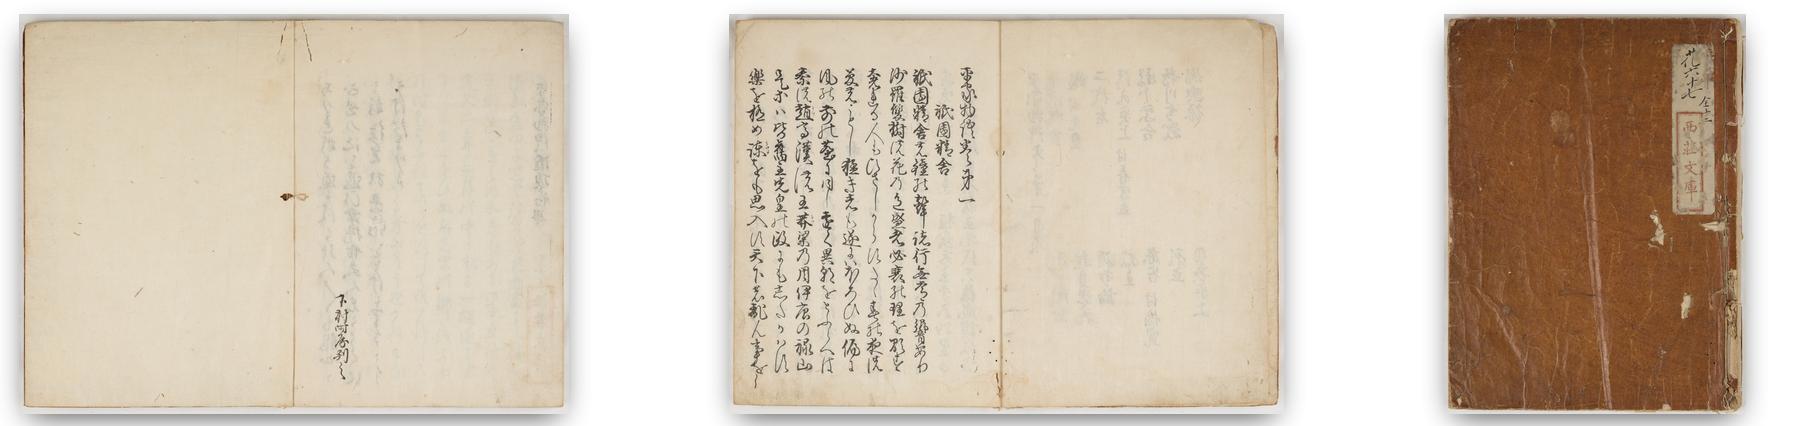 Tale of the Heike, Shimomura-bon